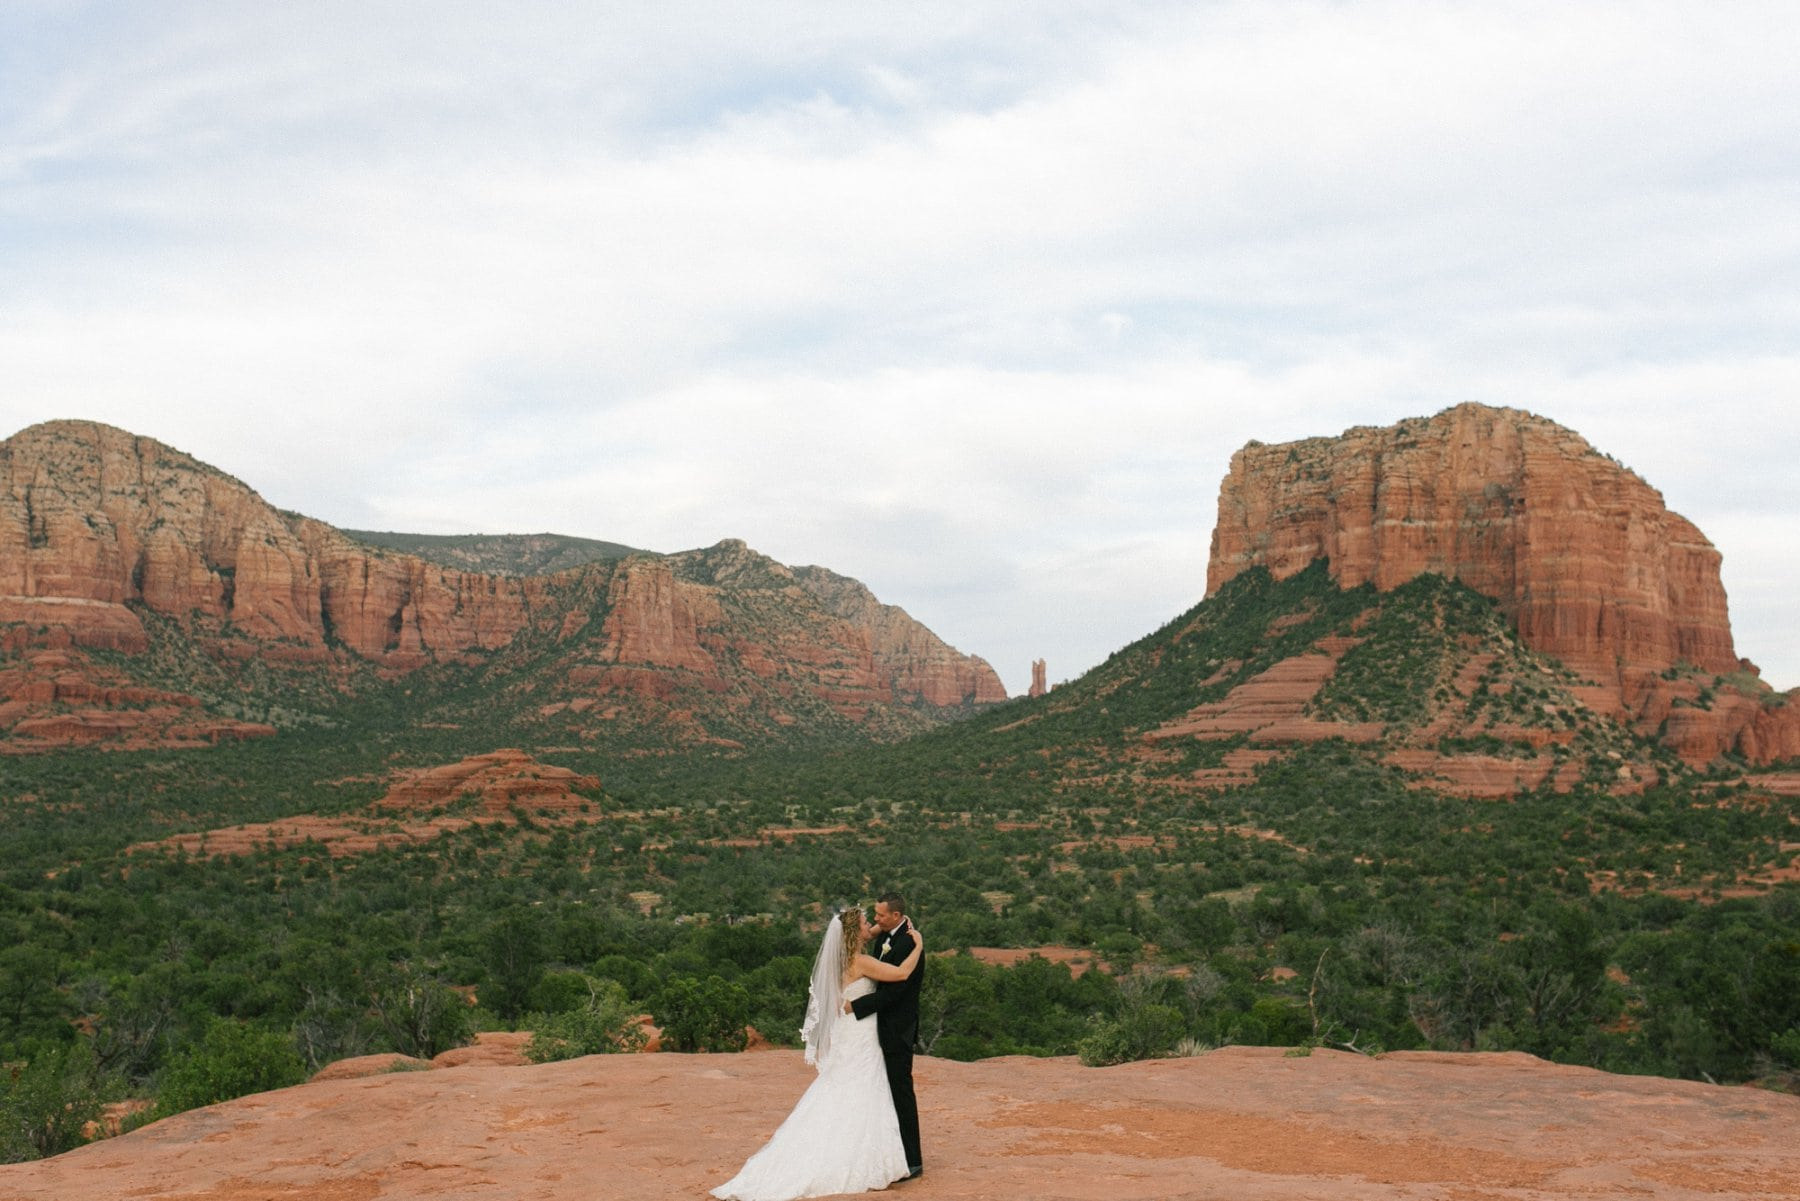 Sedona wedding bride & groom Yavapai Lookout Courthouse Butte